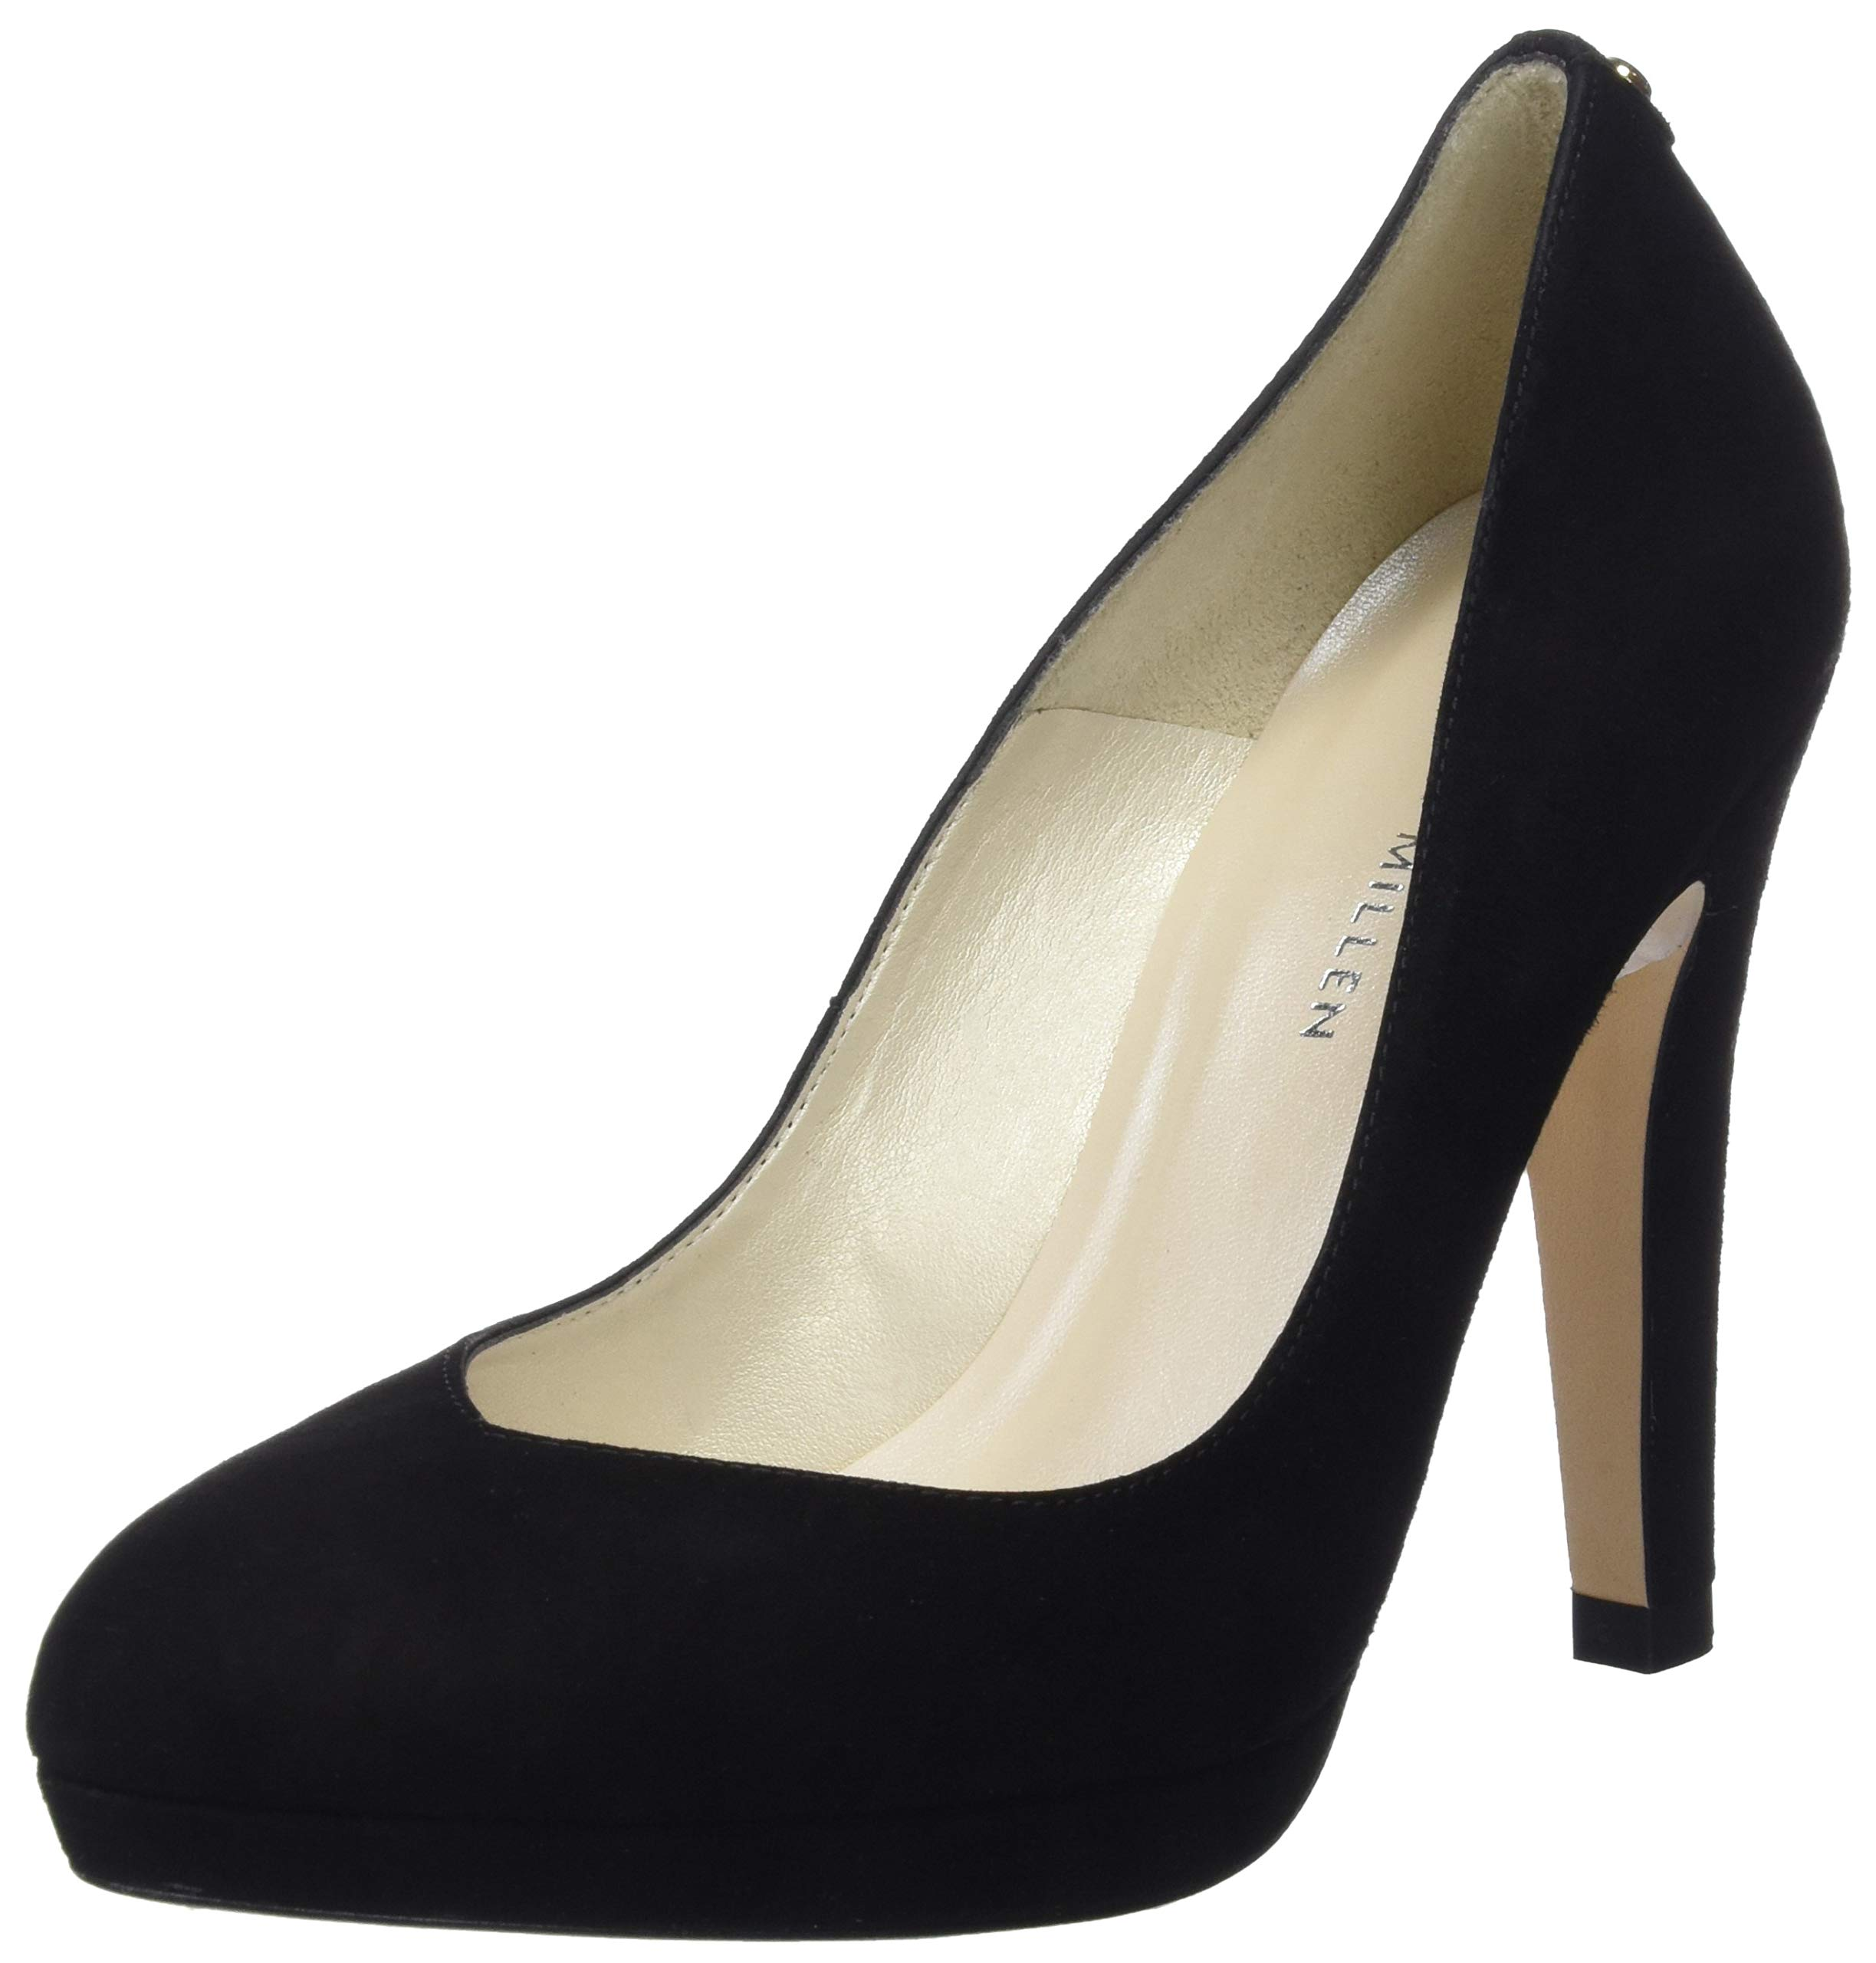 Karen Millen FemmeNoirblack Bout Eu Fashions Platform Limited 0137 Suede Fermé PumpsEscarpins nwmN08